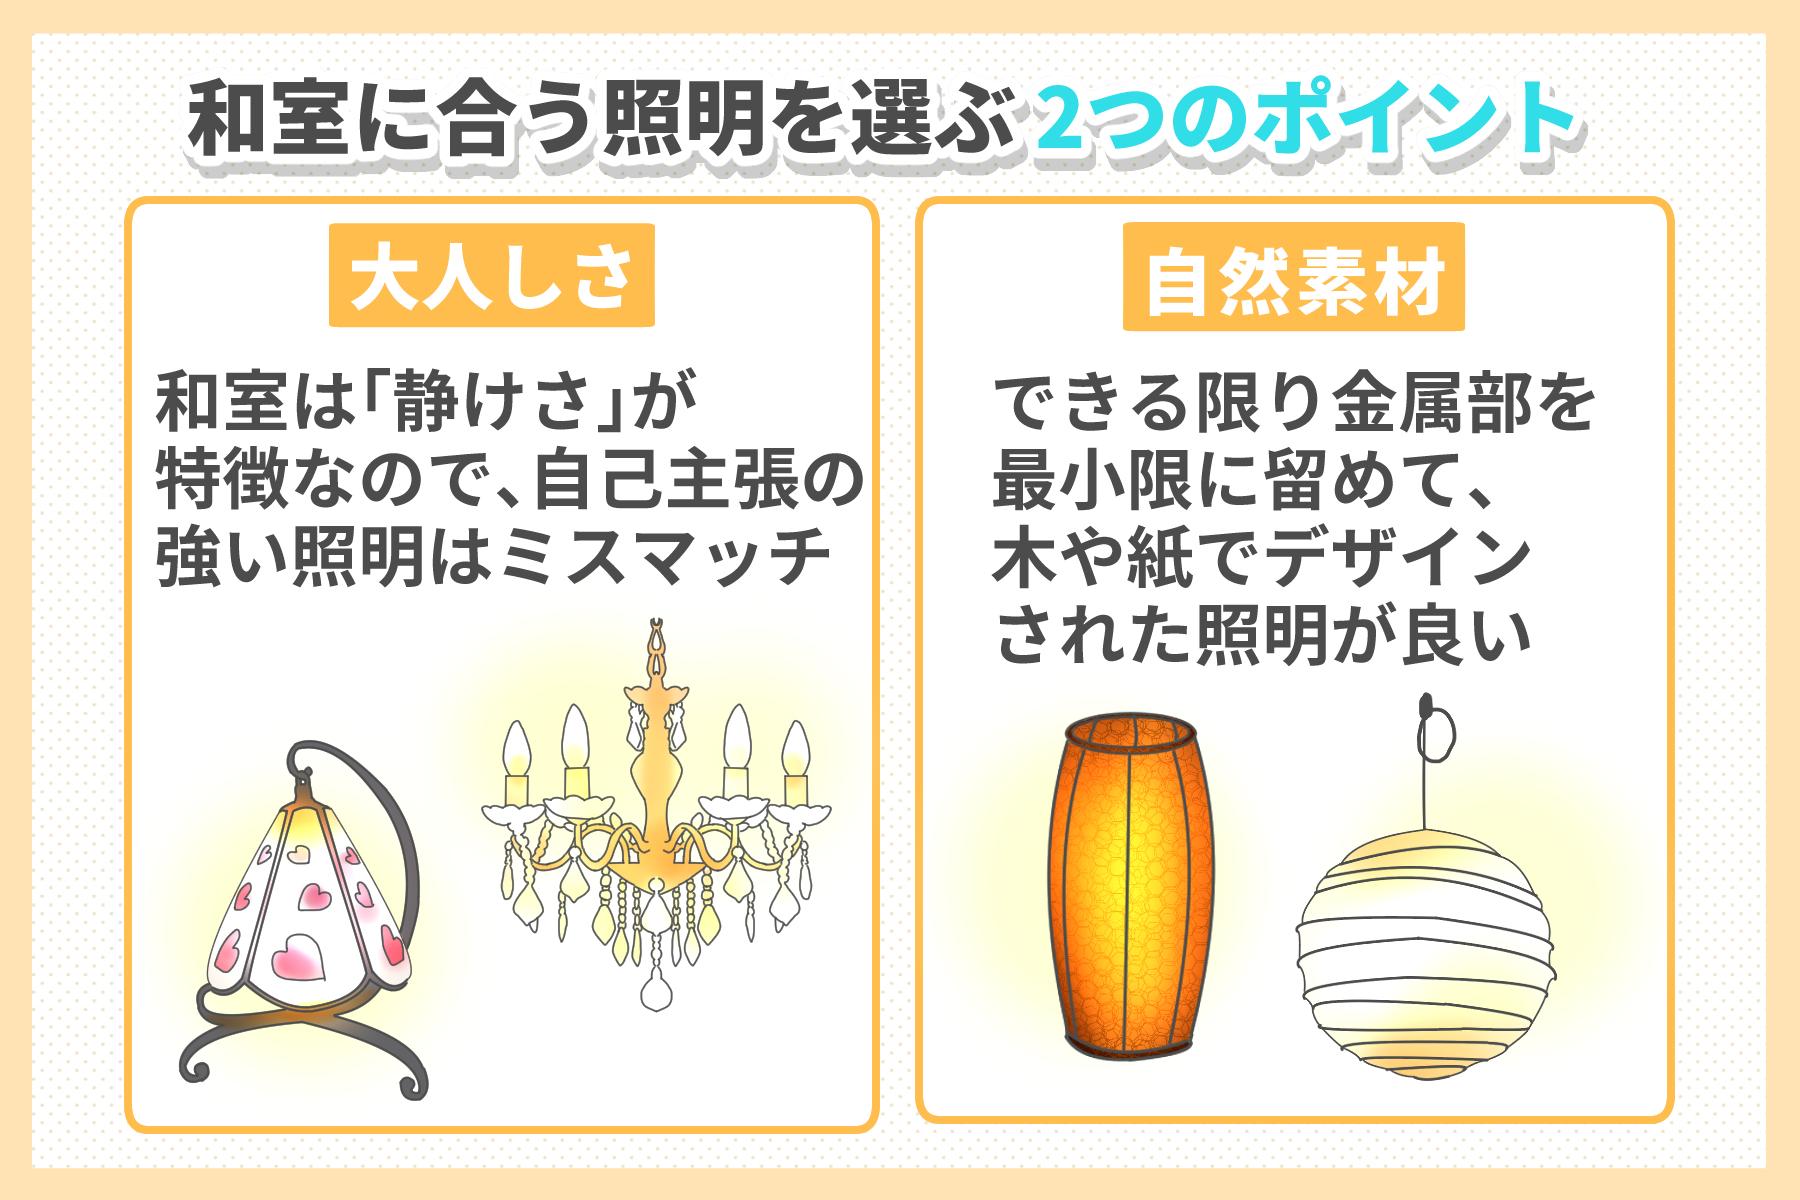 washitsuroom_1.jpg